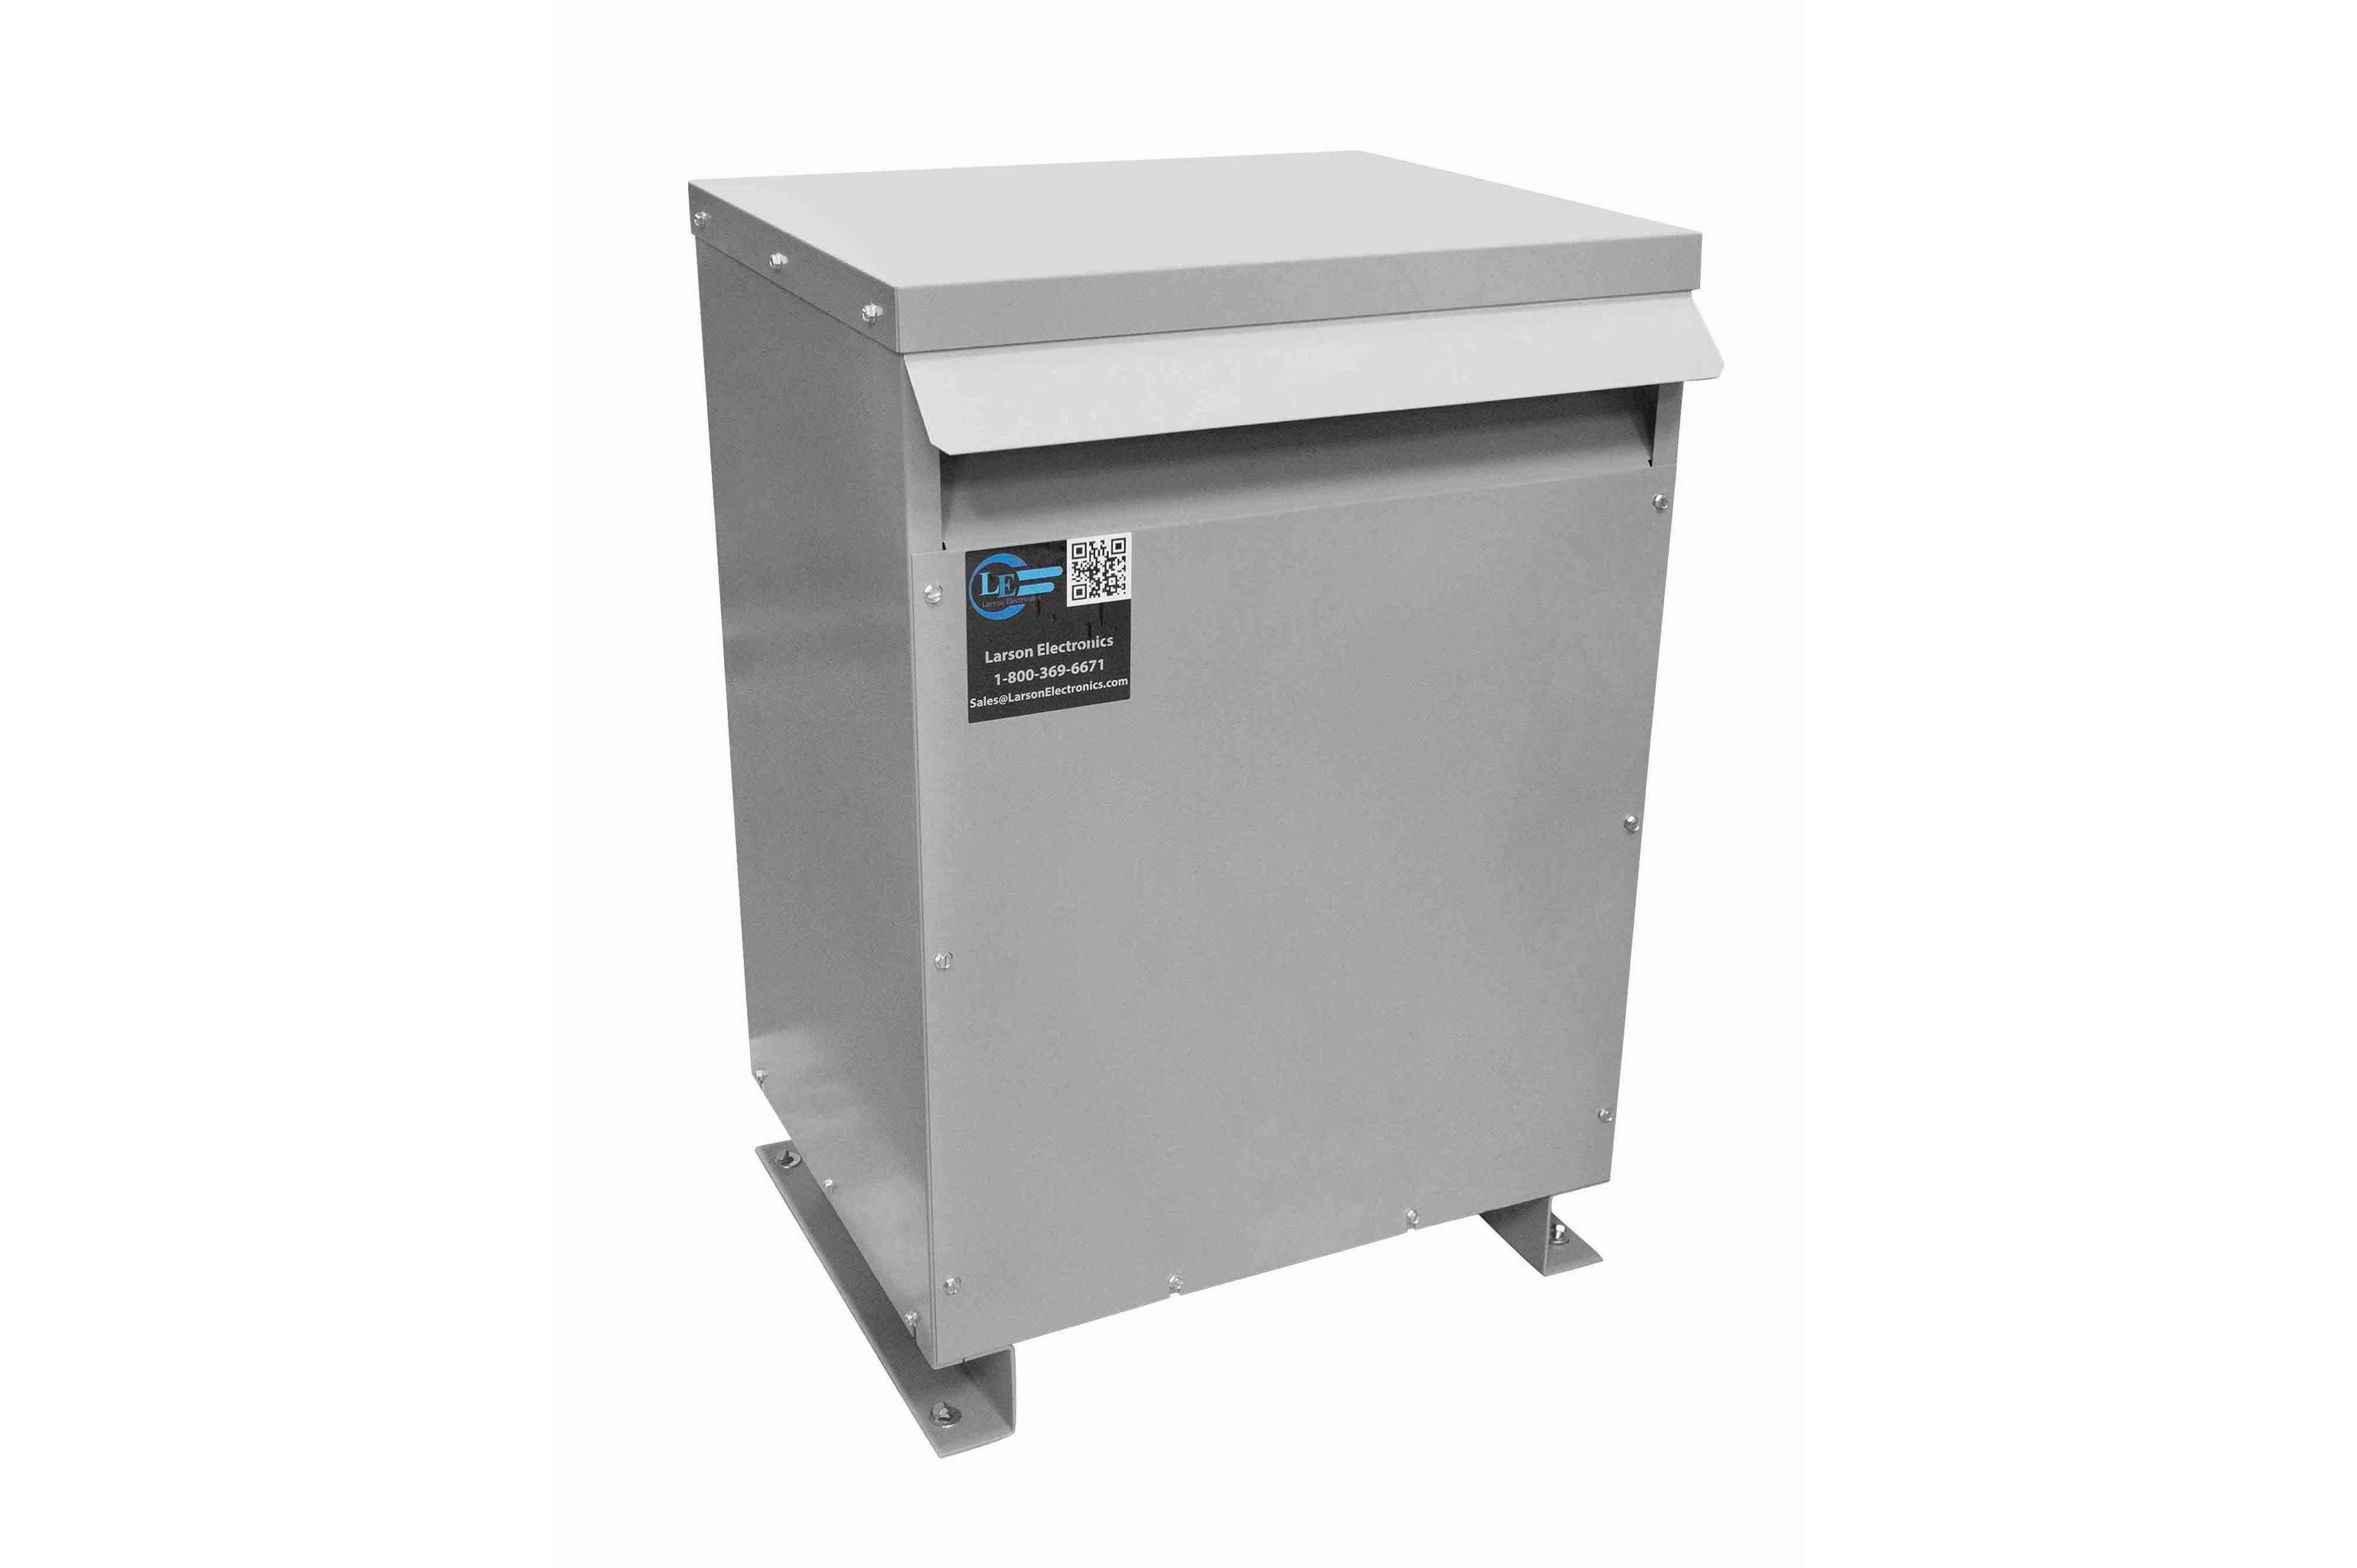 20 kVA 3PH Isolation Transformer, 460V Wye Primary, 208V Delta Secondary, N3R, Ventilated, 60 Hz